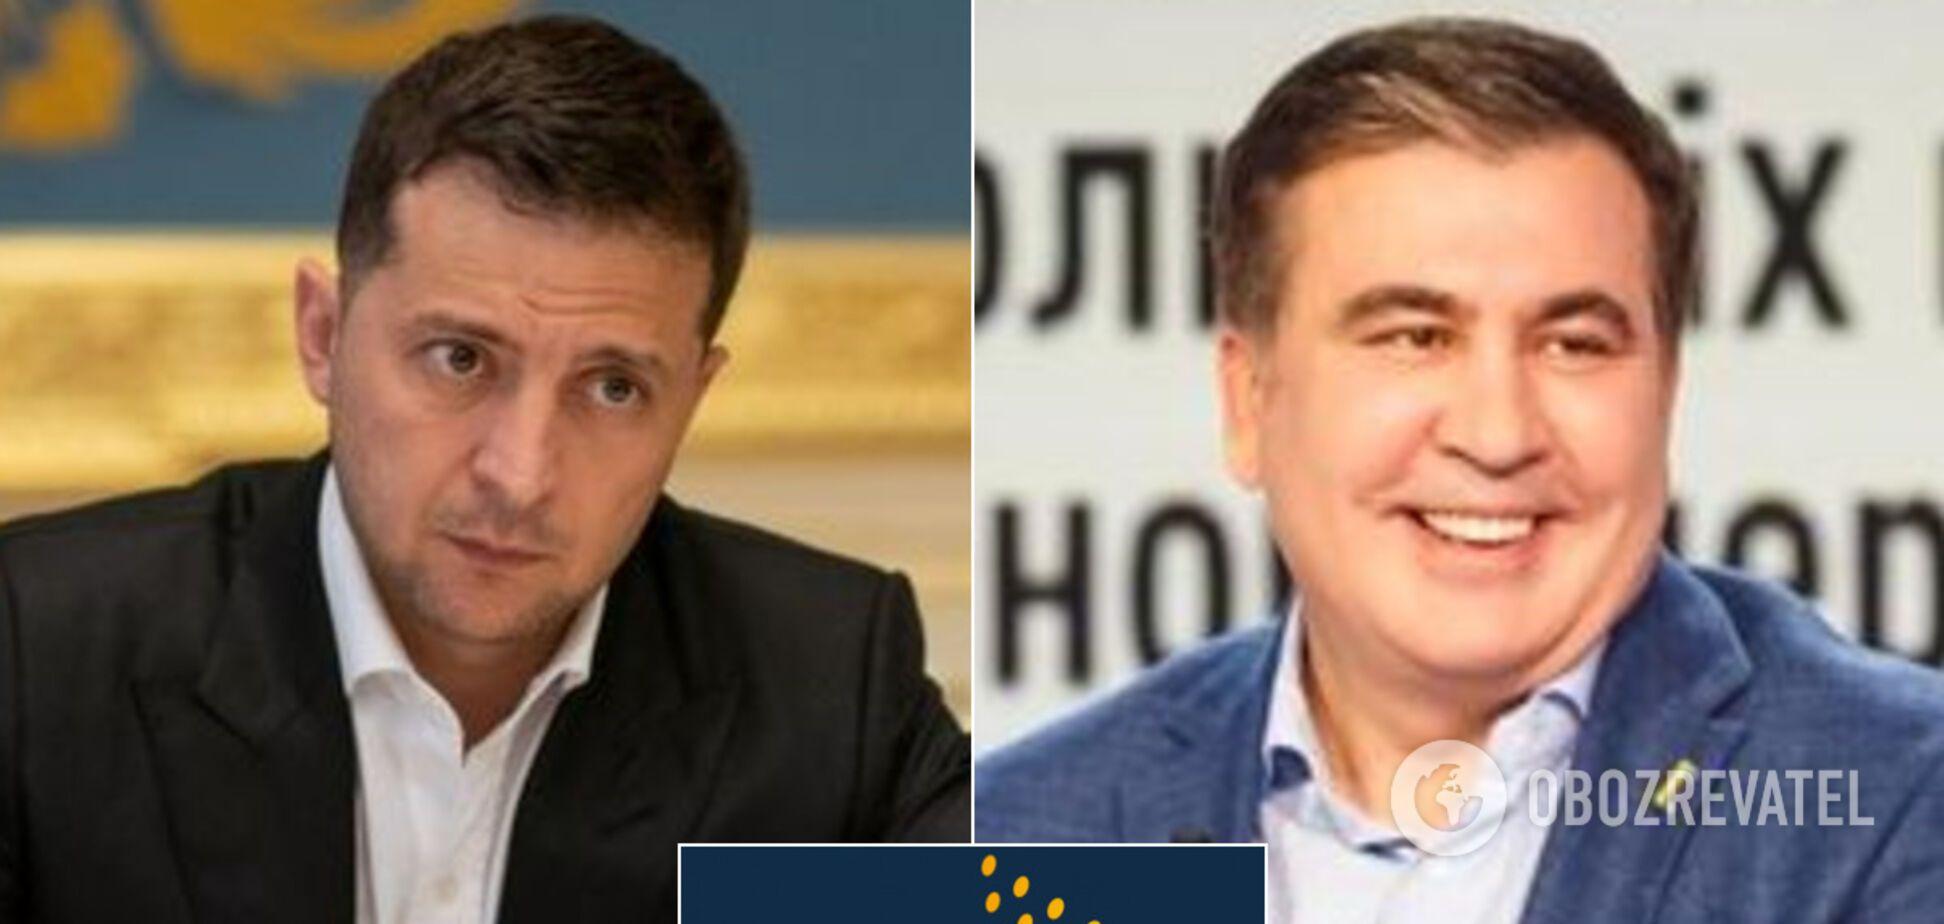 Зеленский и Саакашвили будут работать в Нацсовете реформ